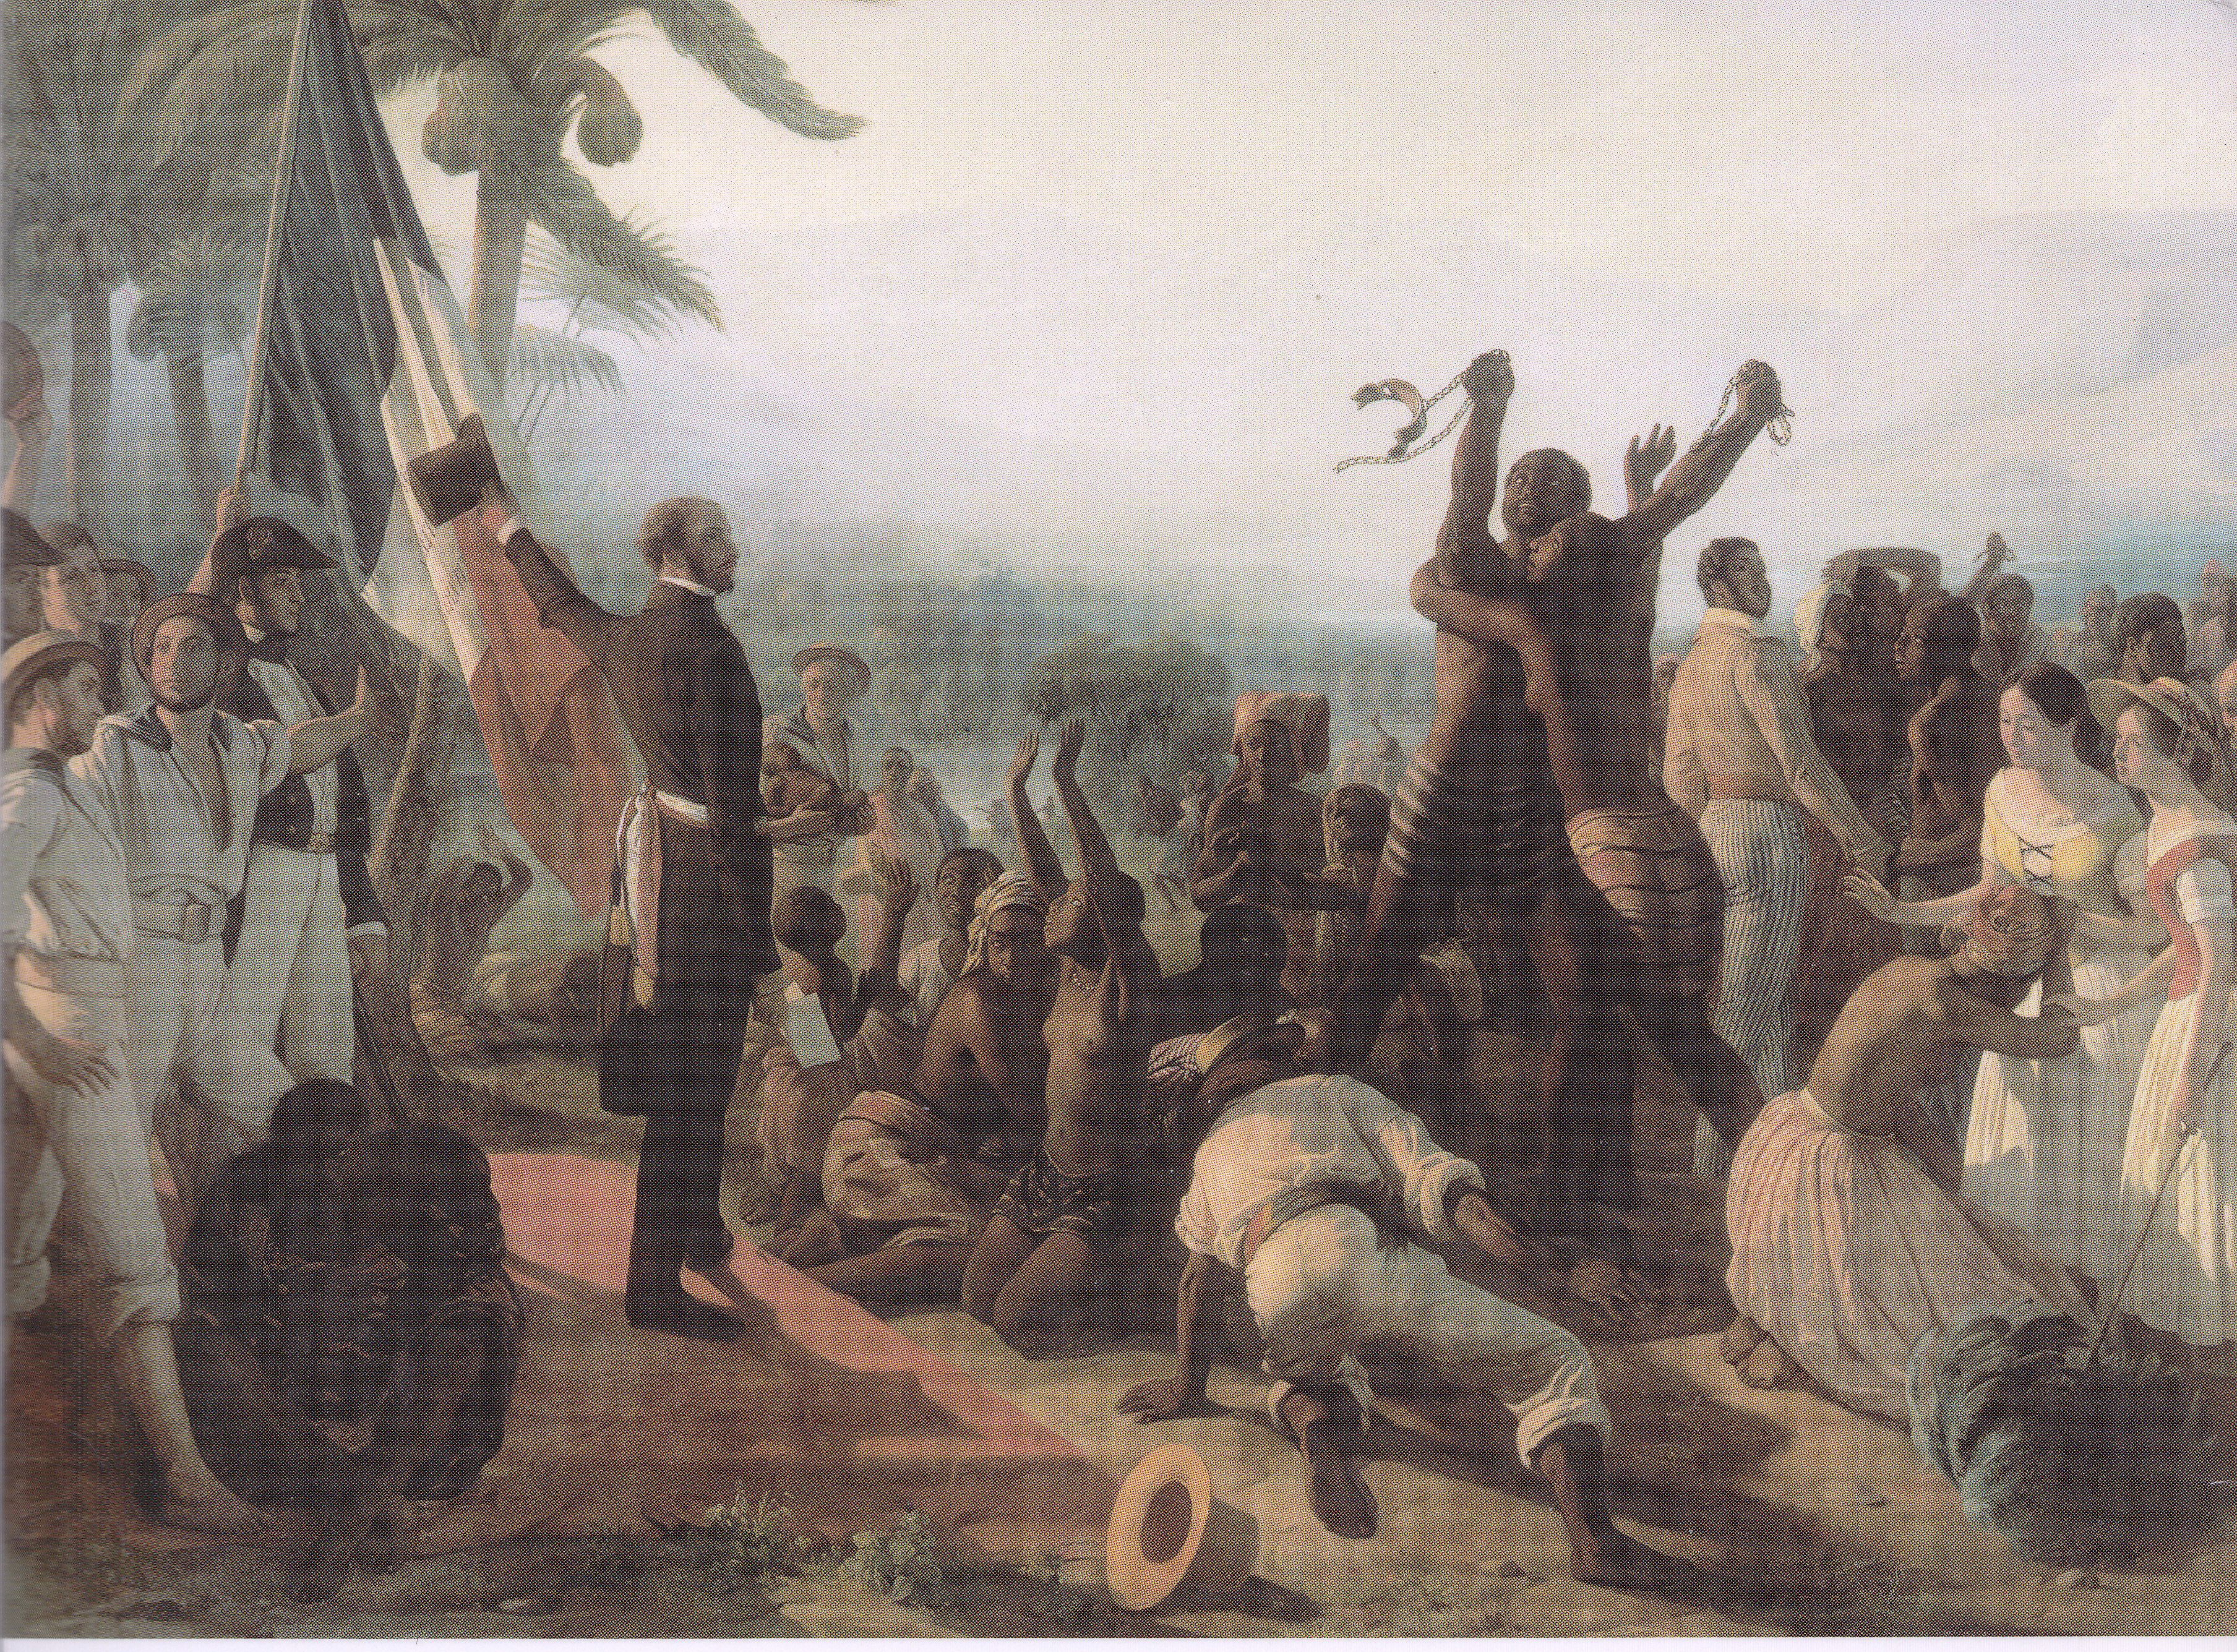 Enlightened Colonialism